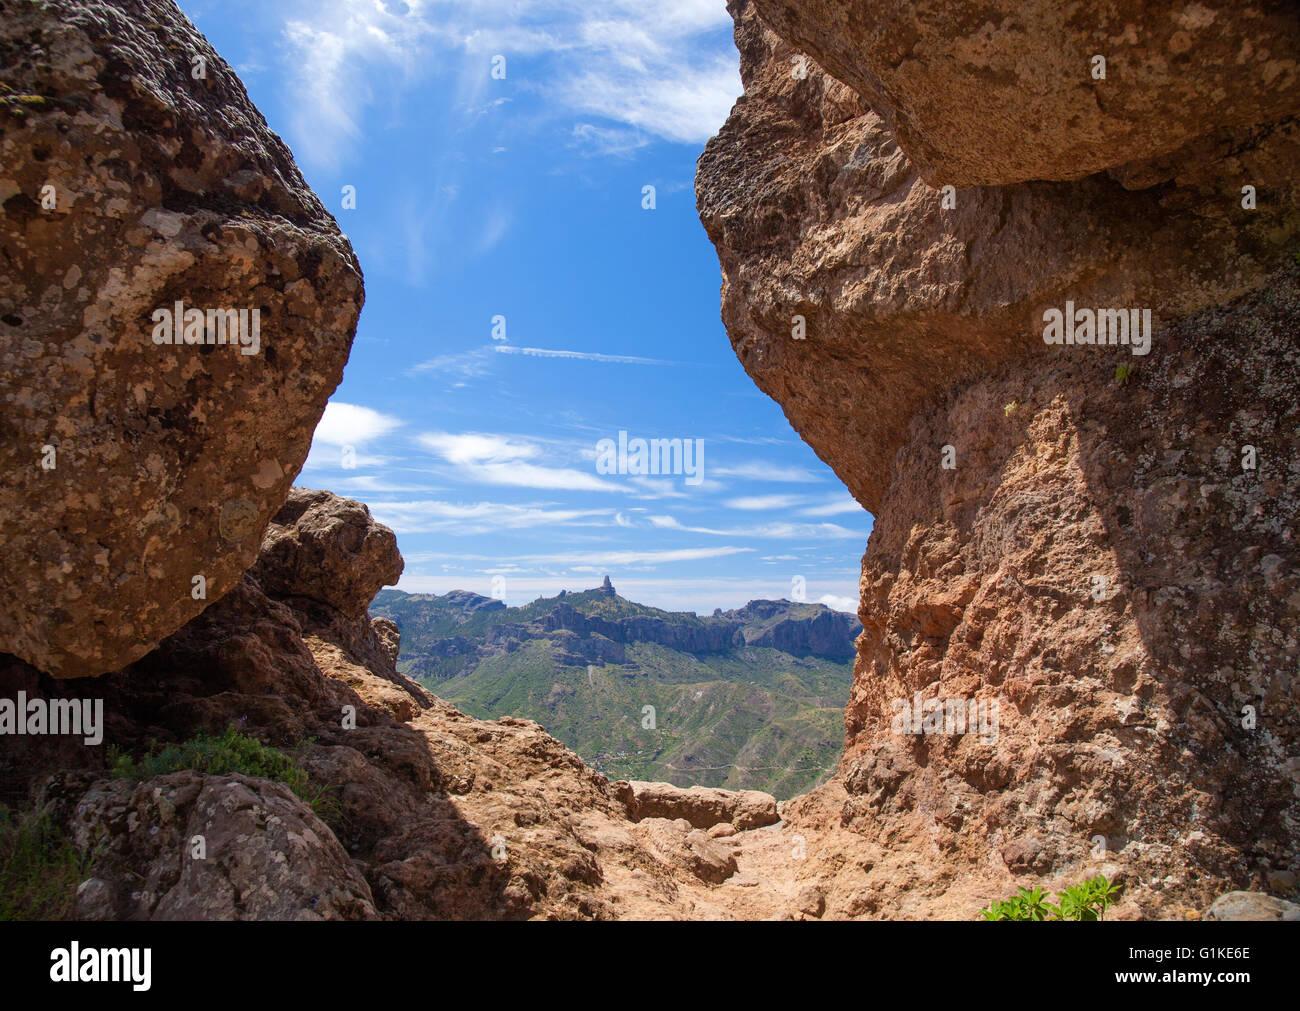 Gran Canaria, view towards Roque Nublo from caves Cuevas de Caballero at cliff Risco Chapi Stock Photo